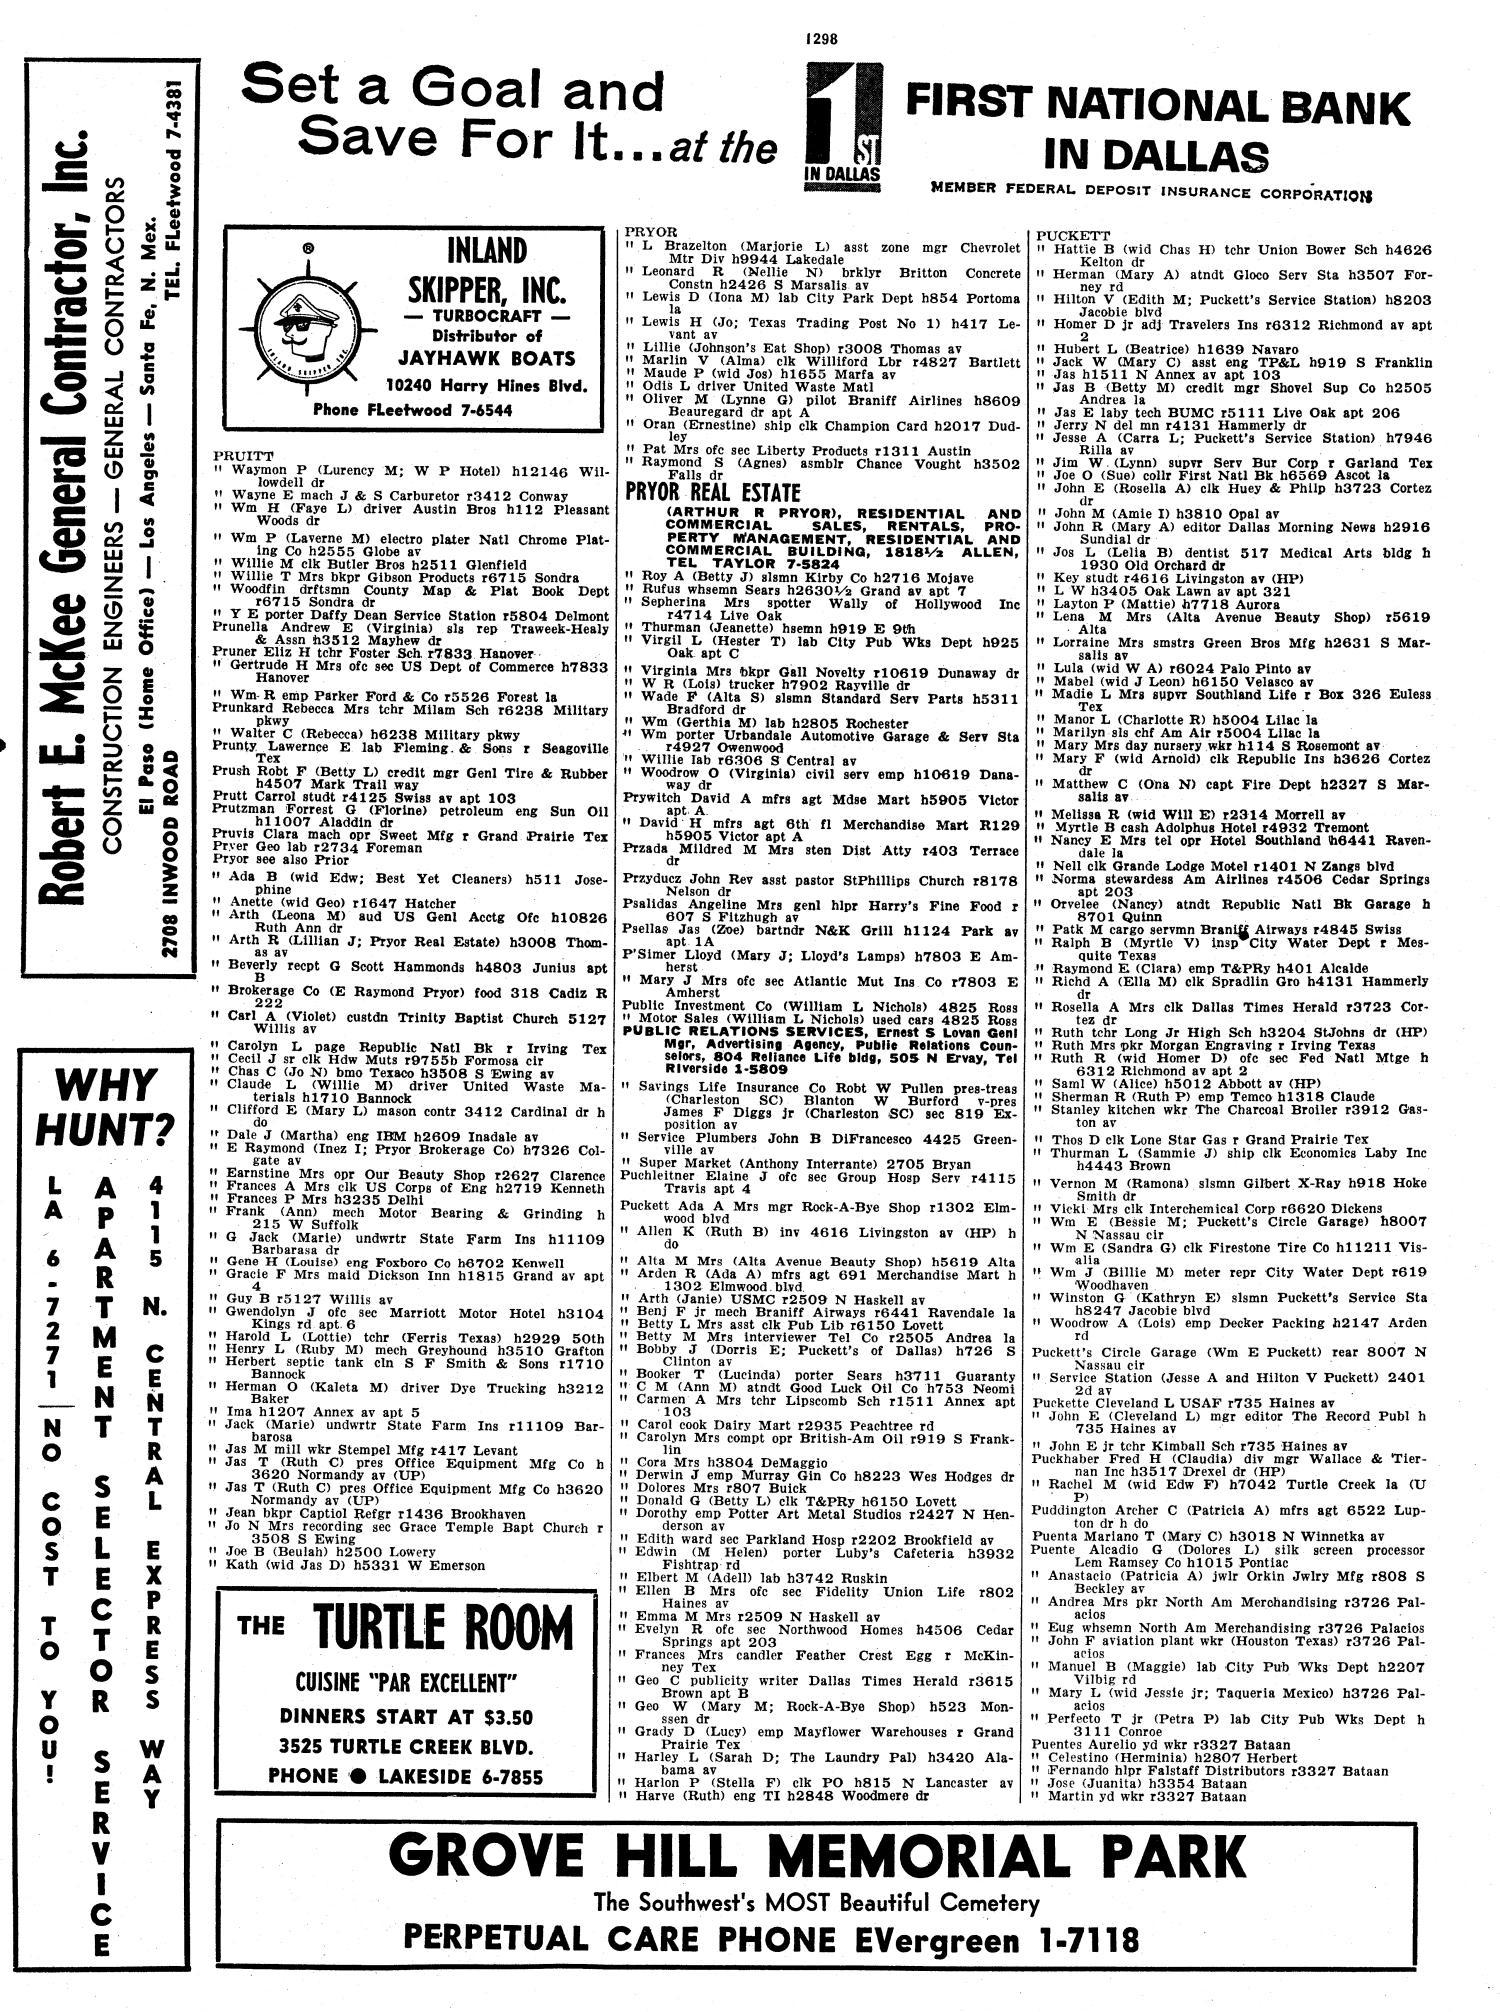 Dallas City Directory, 1961 - Page 1,298 - The Portal to